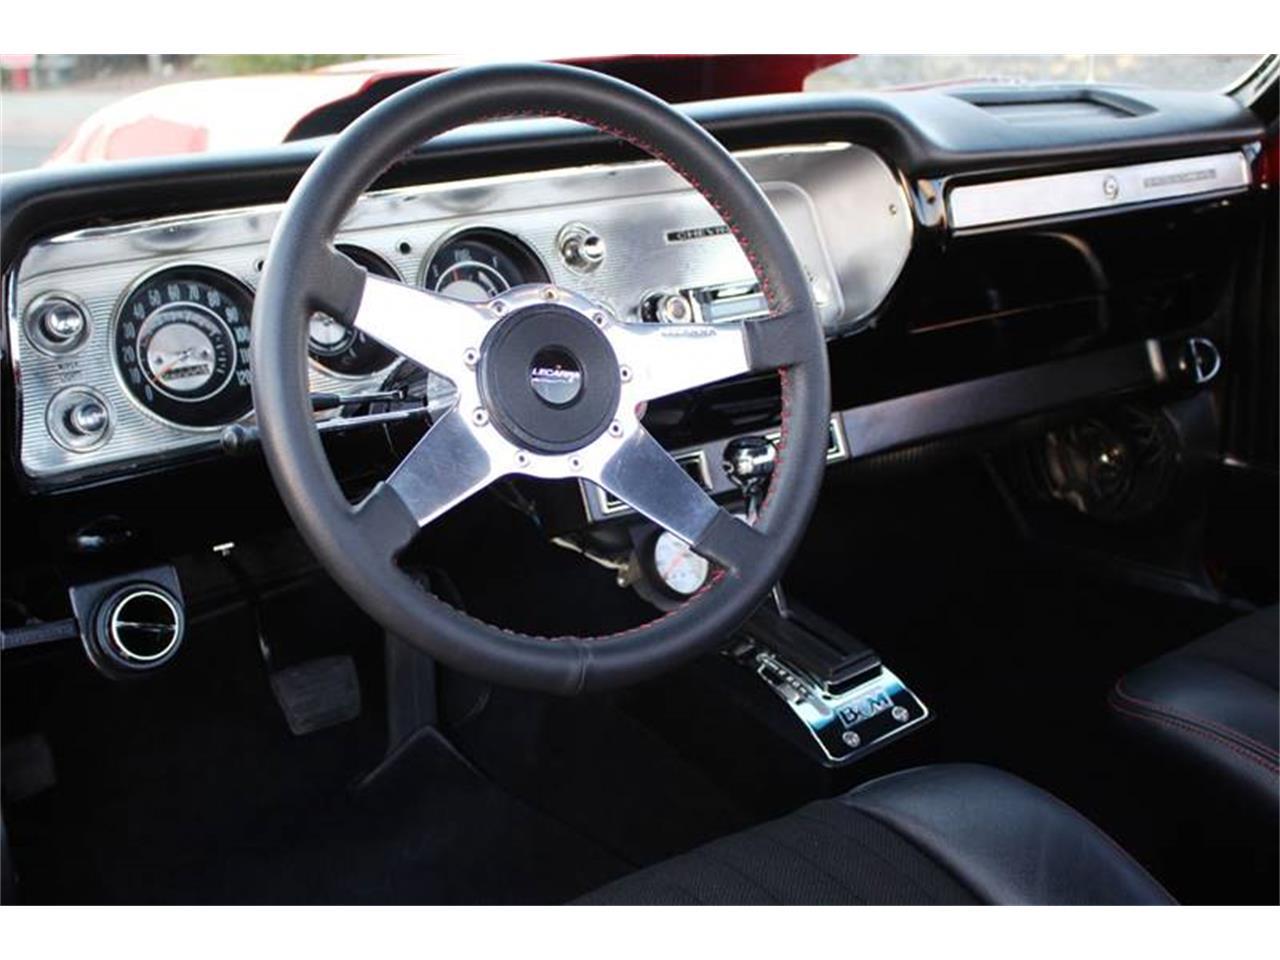 Large Picture of '64 Chevrolet El Camino located in La Verne California - $28,900.00 - MH9D